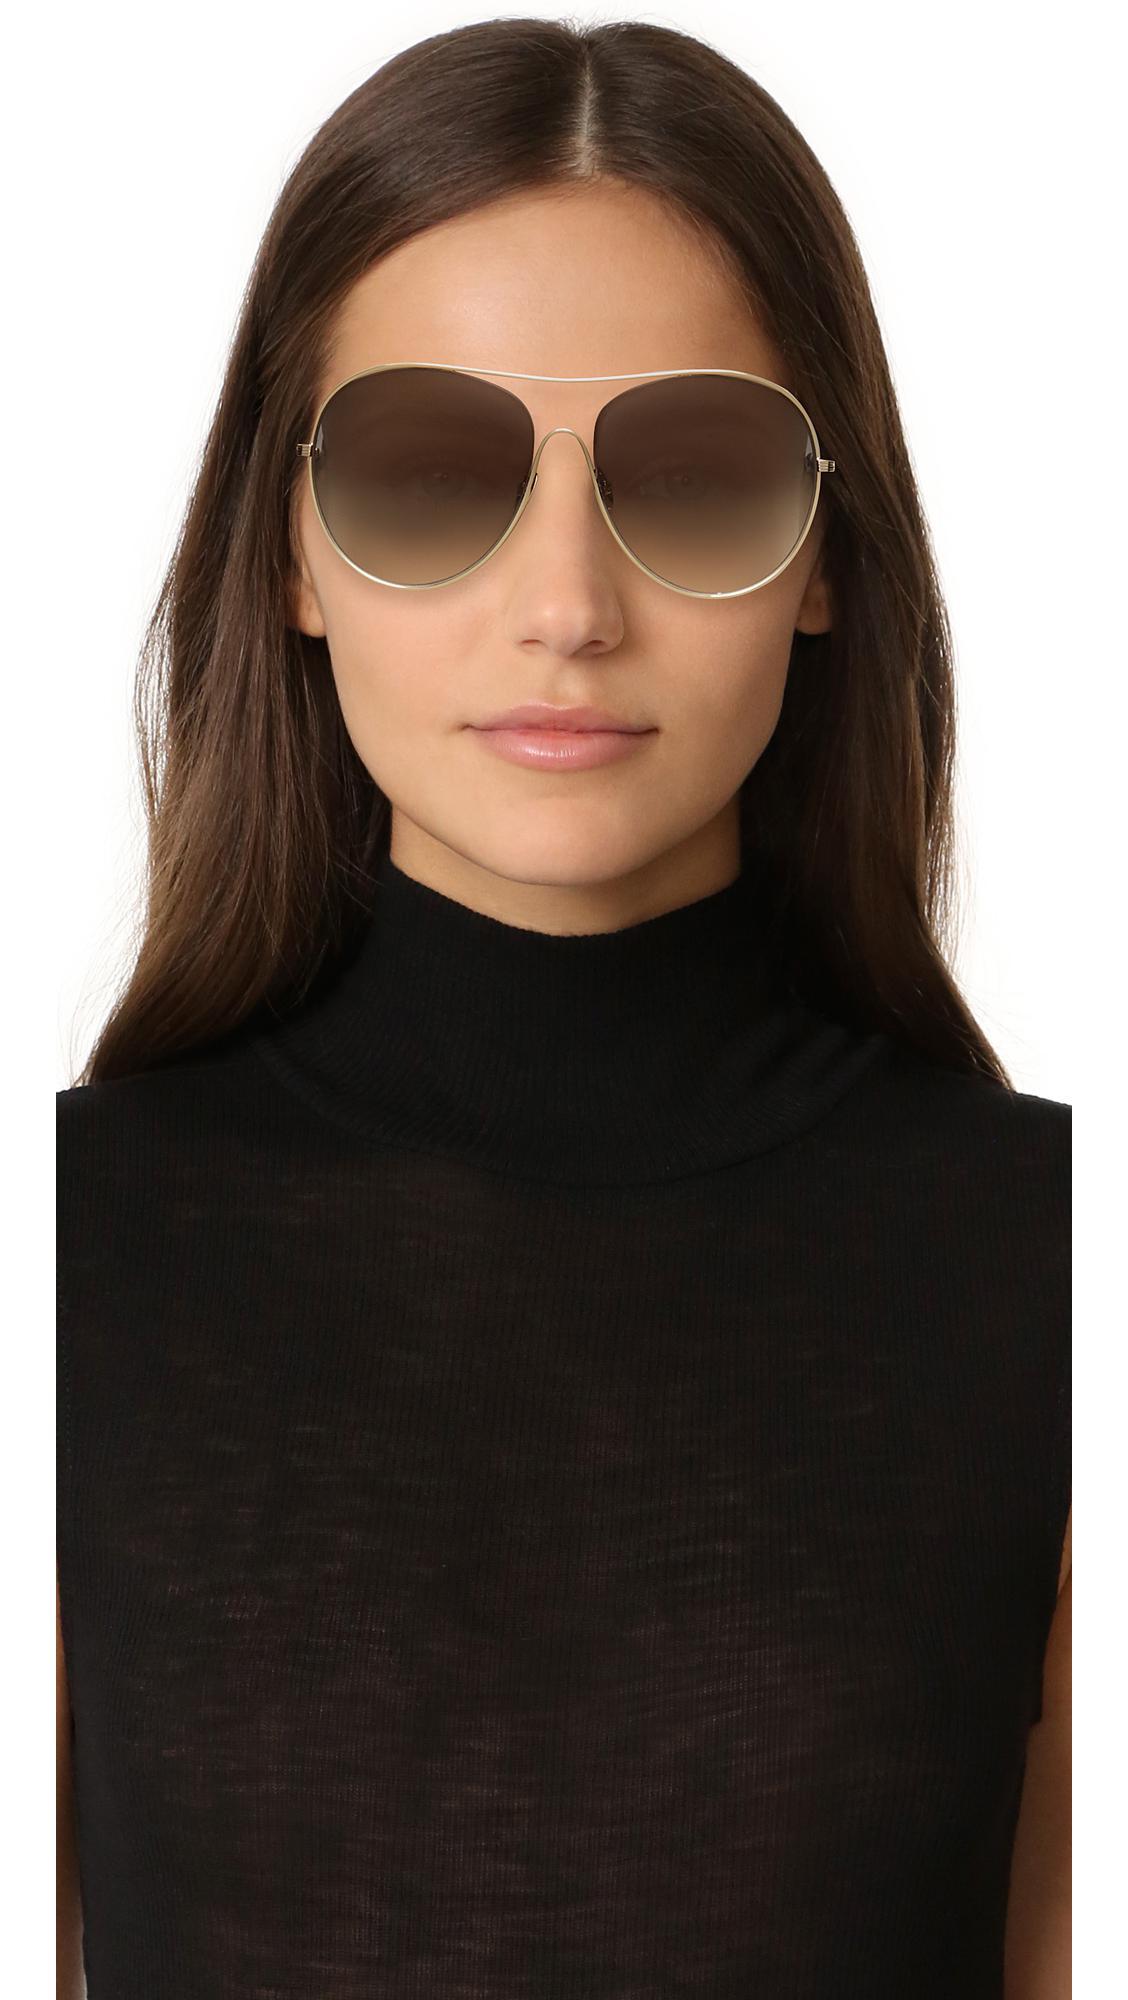 52fece503 Victoria Beckham Loop Round Aviator Sunglasses in Metallic - Lyst